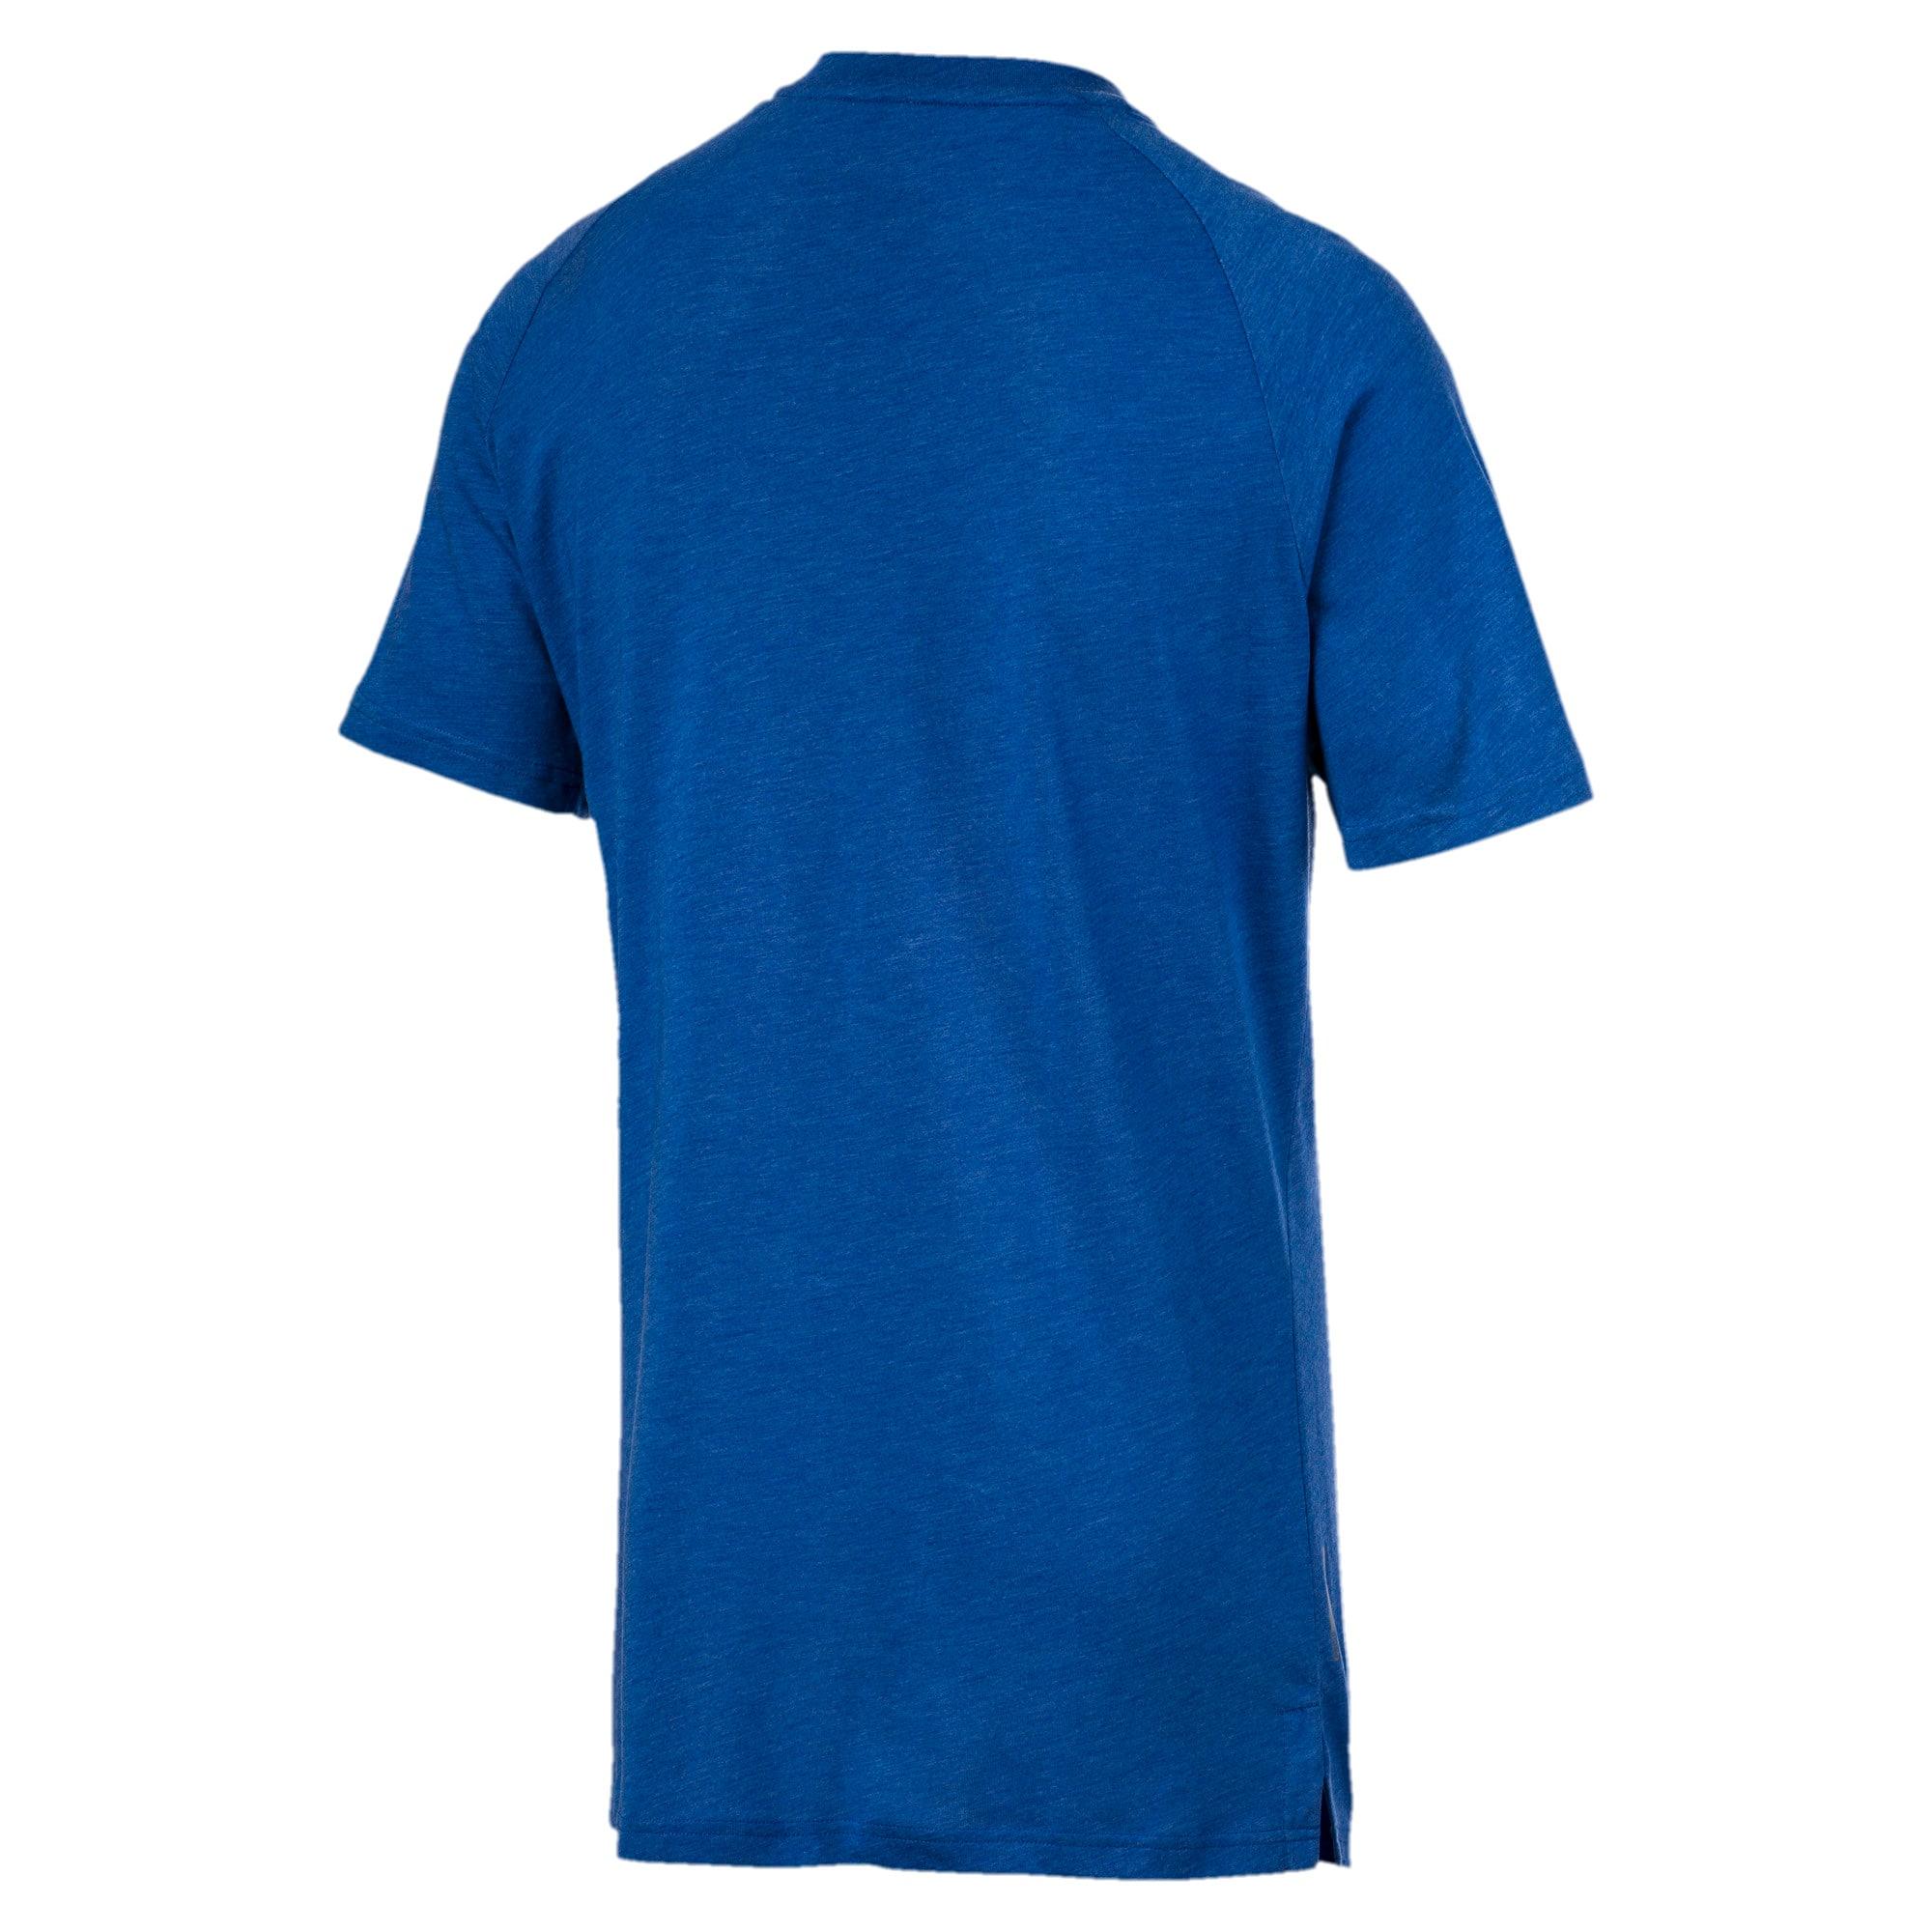 Thumbnail 5 of Reactive Short Sleeve Men's Training Tee, Galaxy Blue Heather, medium